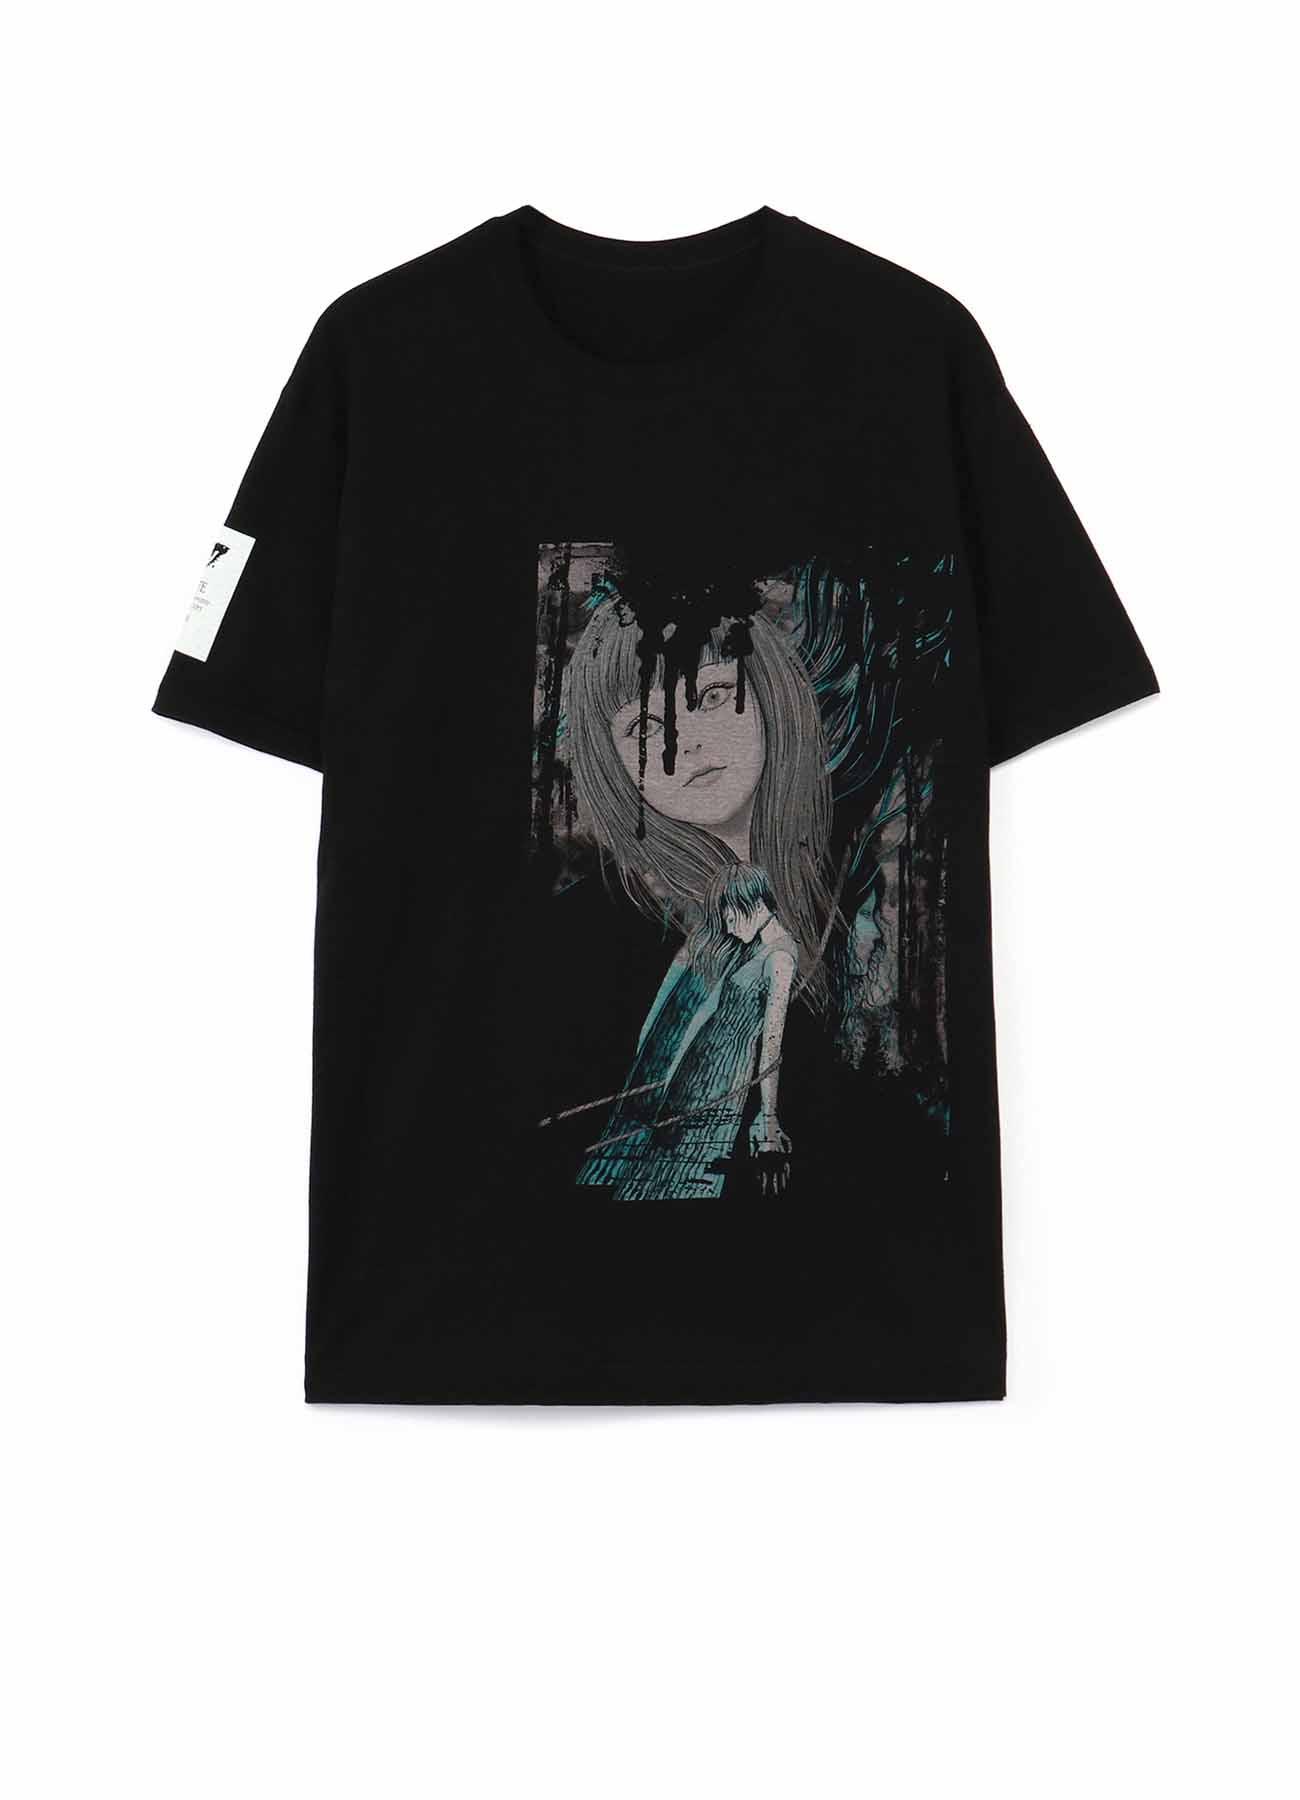 Junji ITO Twisted Visions/Tomie Hanging Blimp T-shirt